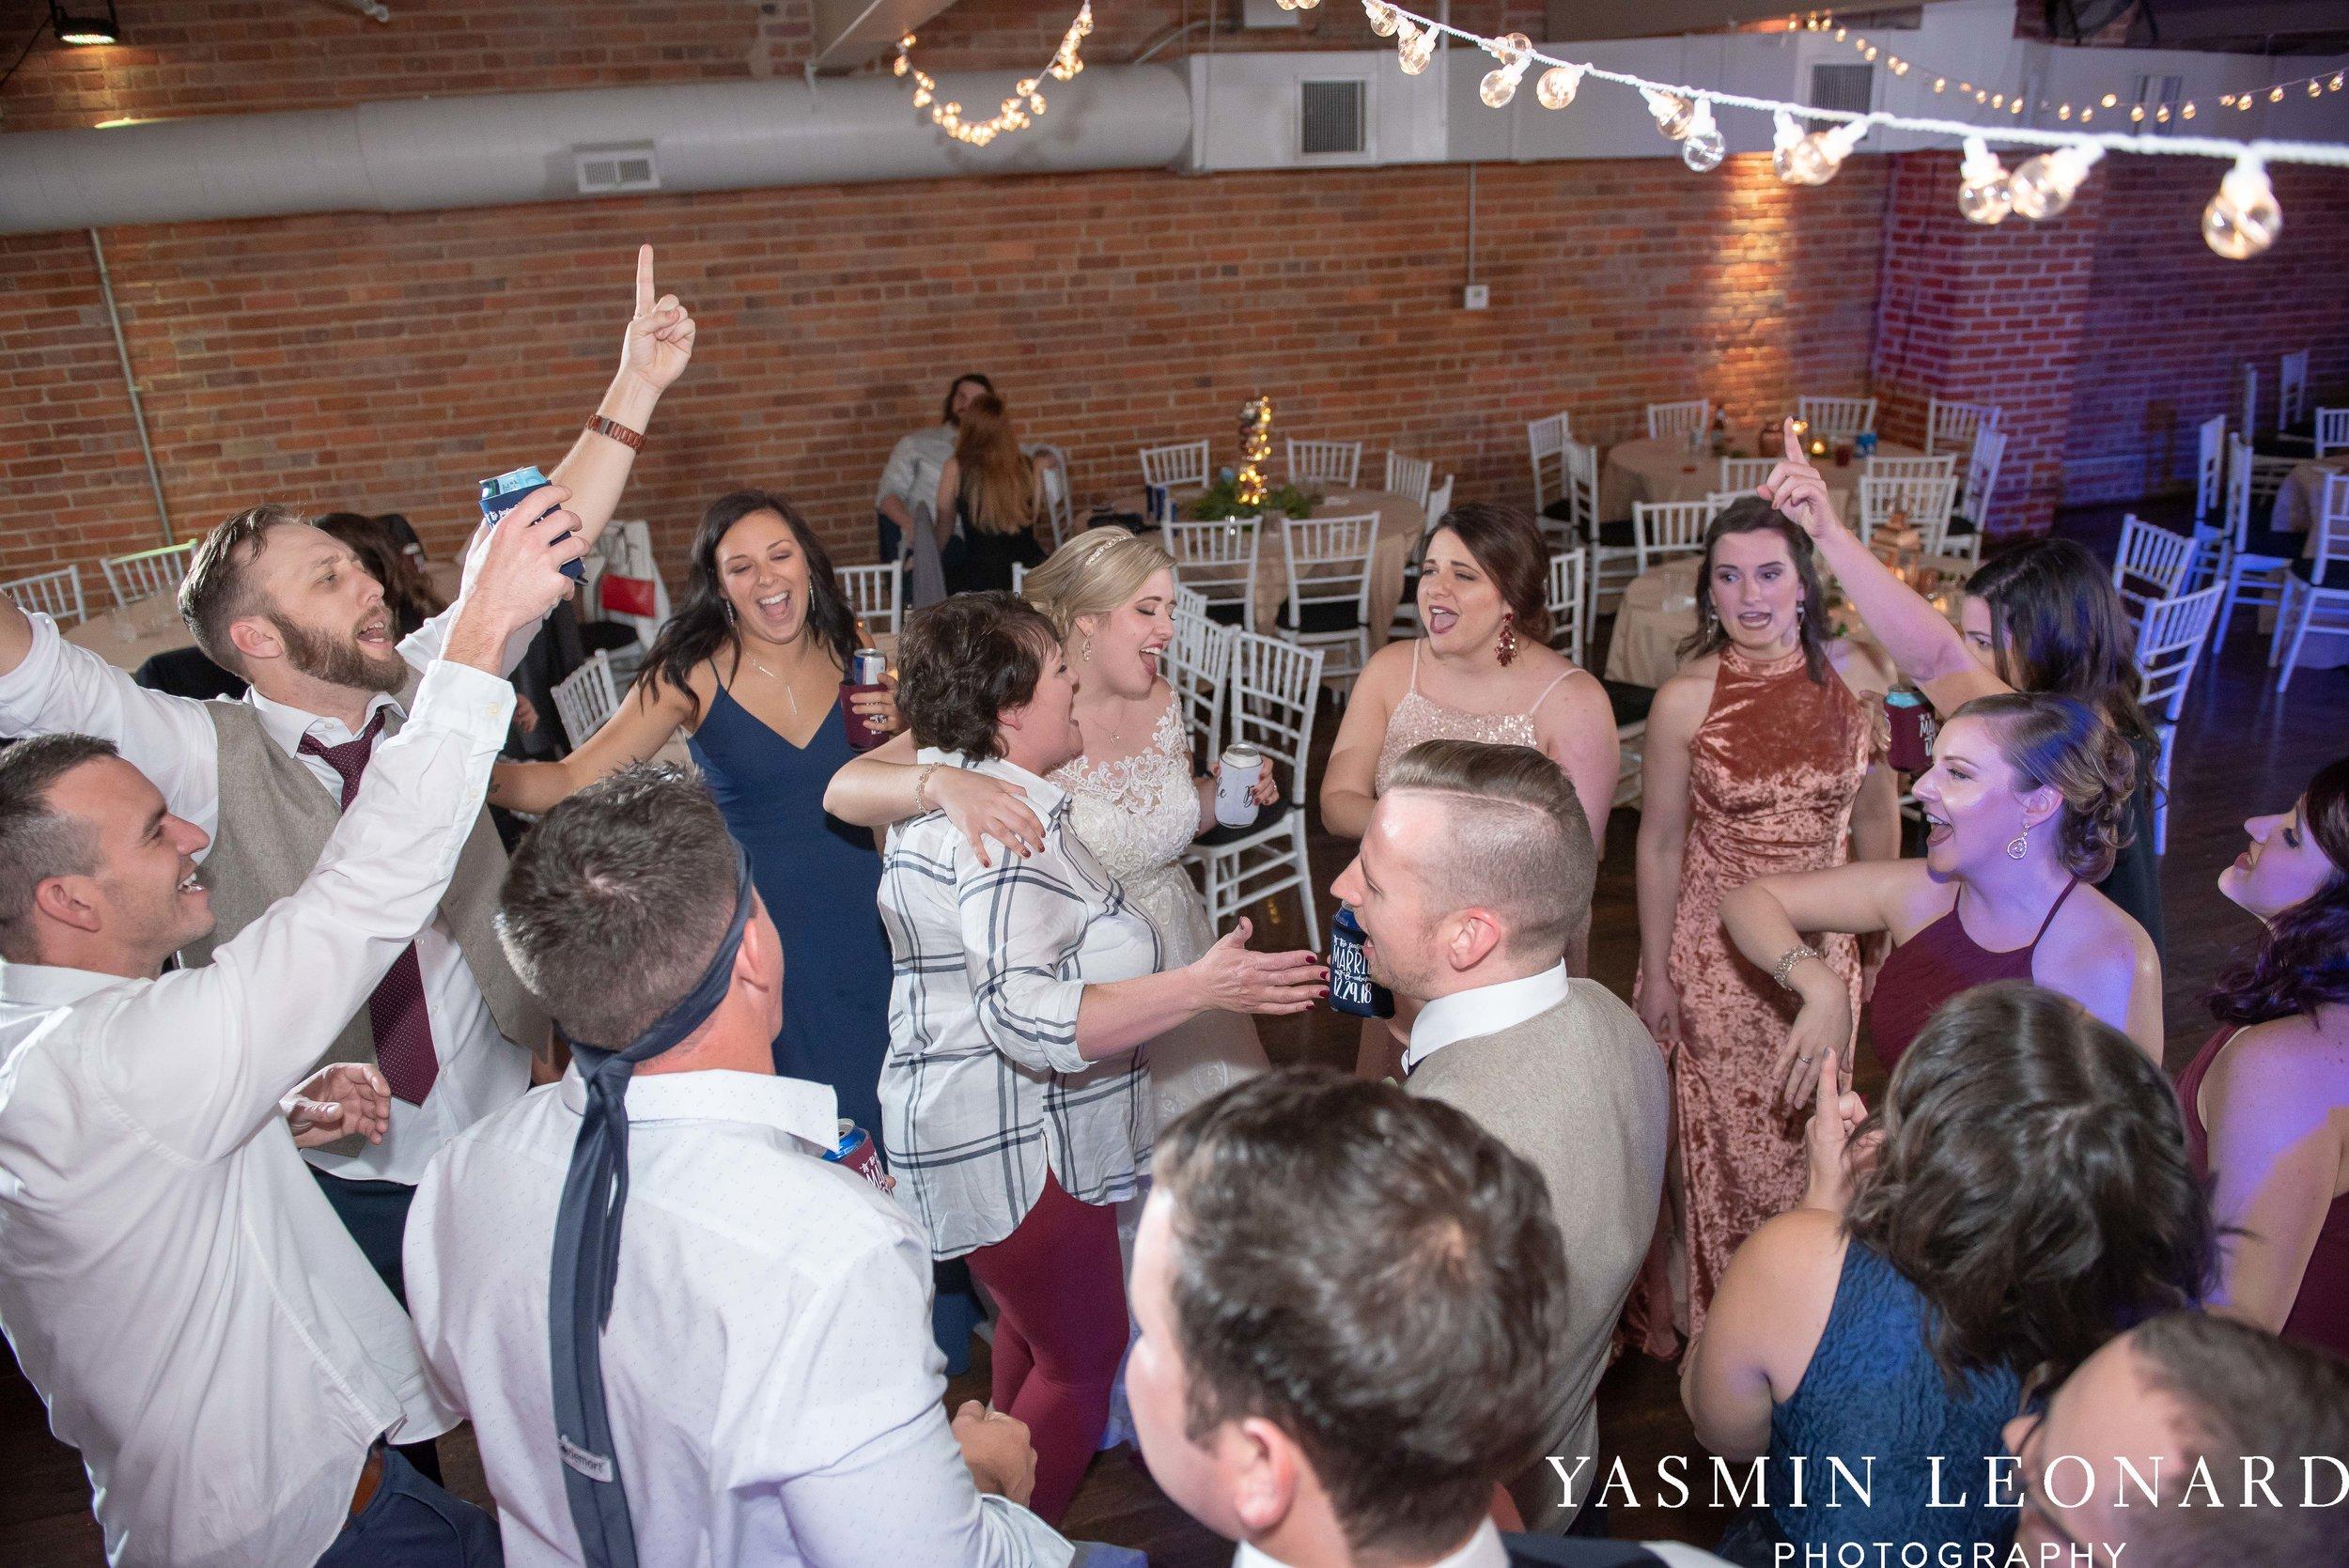 Rebekah and Matt - 105 Worth Event Centre - Yasmin Leonard Photography - Asheboro Wedding - NC Wedding - High Point Weddings - Triad Weddings - Winter Wedding-74.jpg